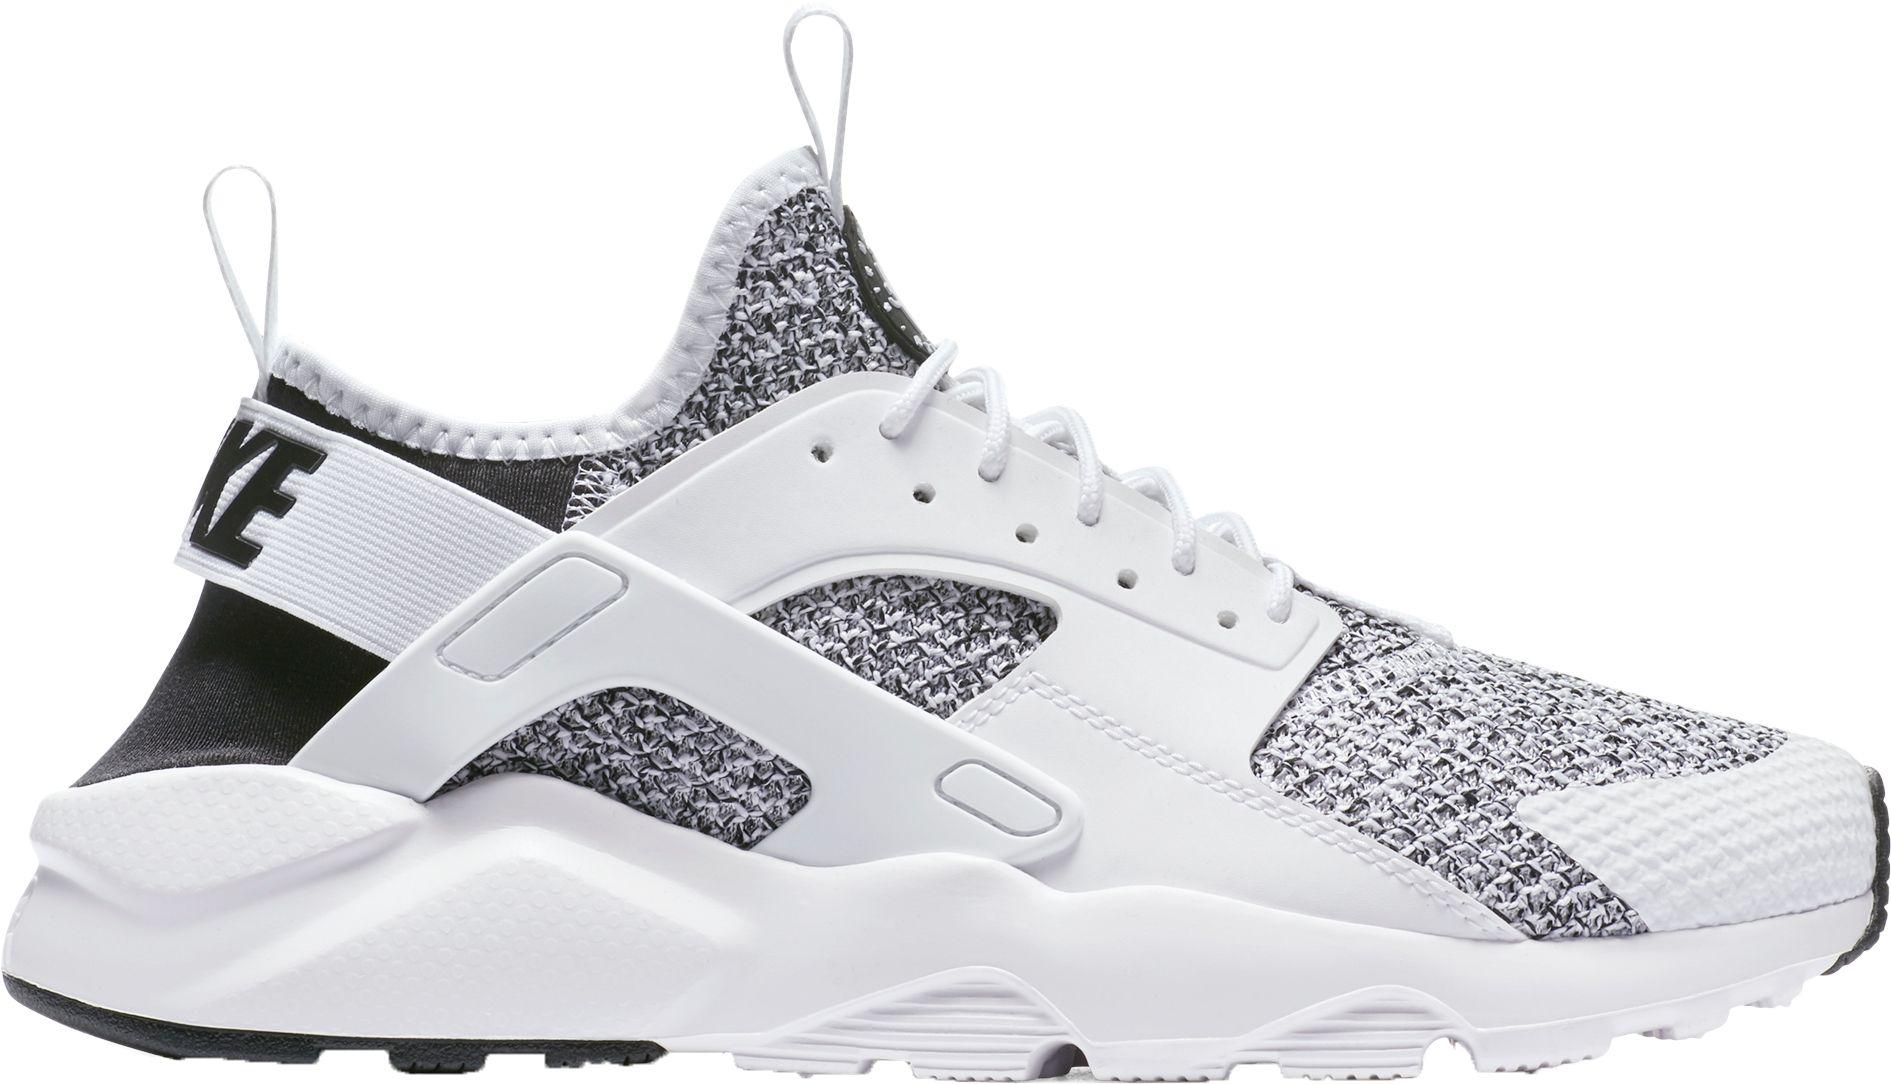 48be103c95f7 Nike Men s Air Huarache Run Ultra SE Shoes